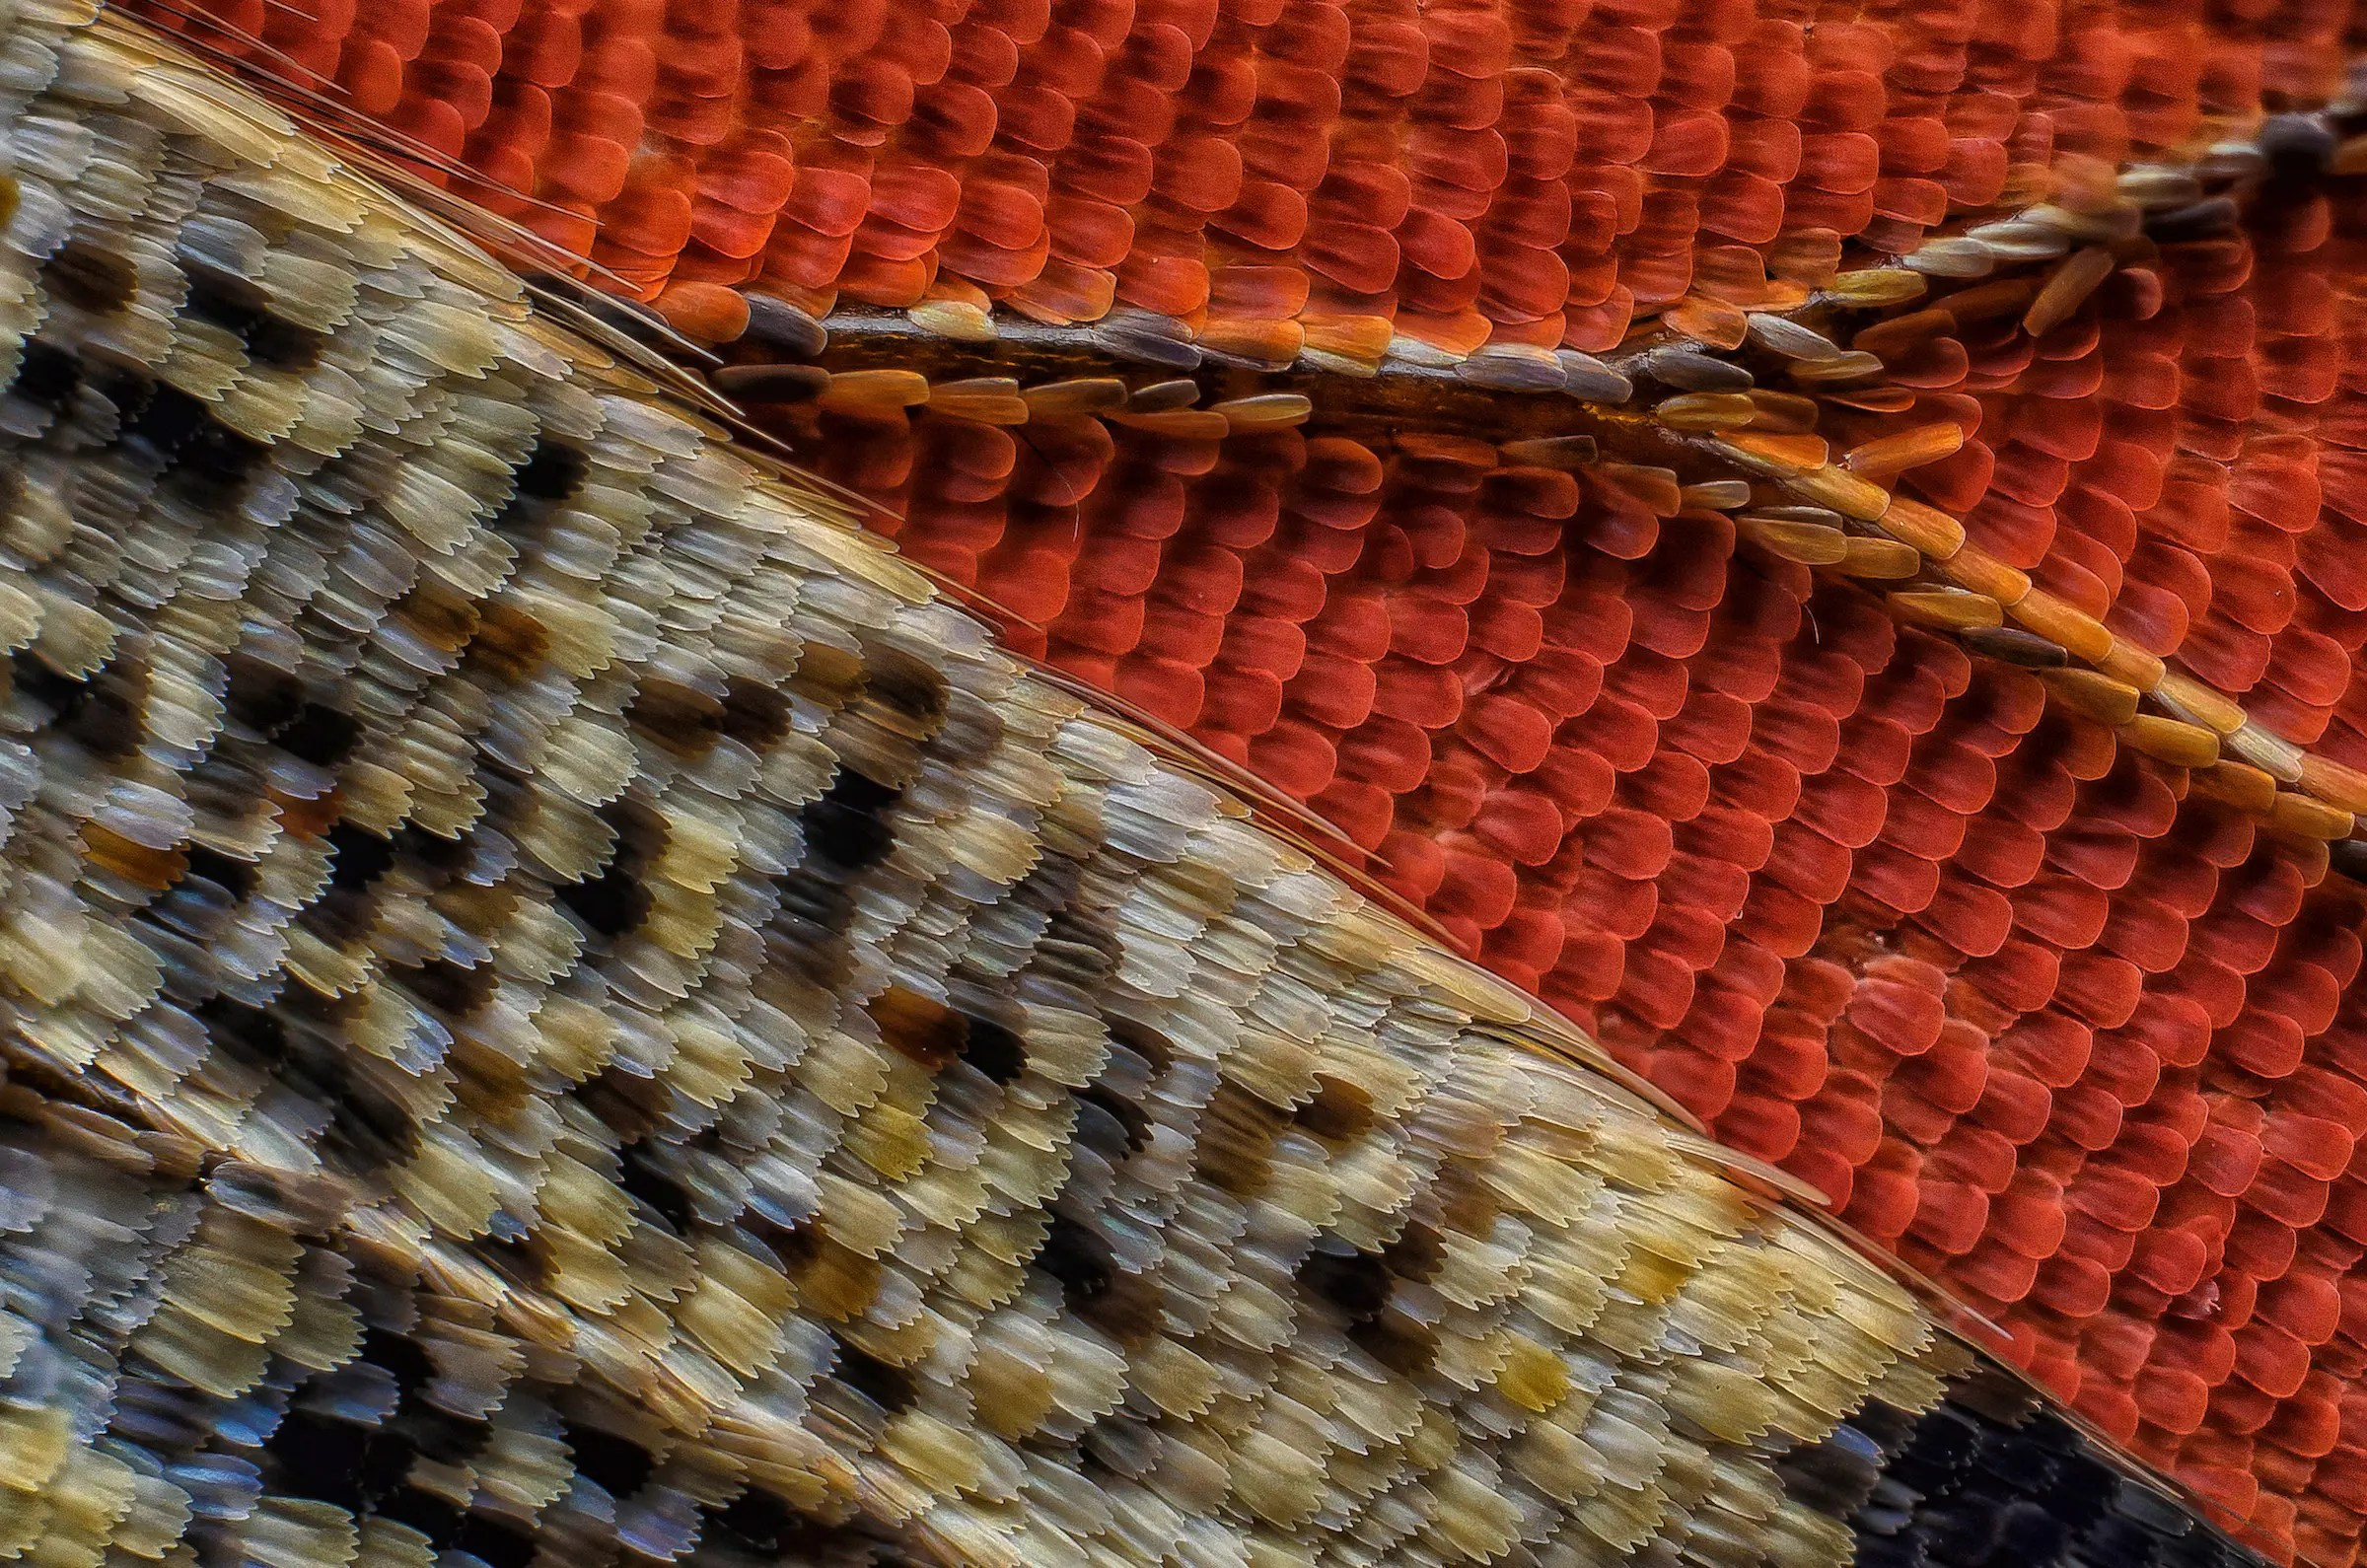 Scales of a butterfly wing underside